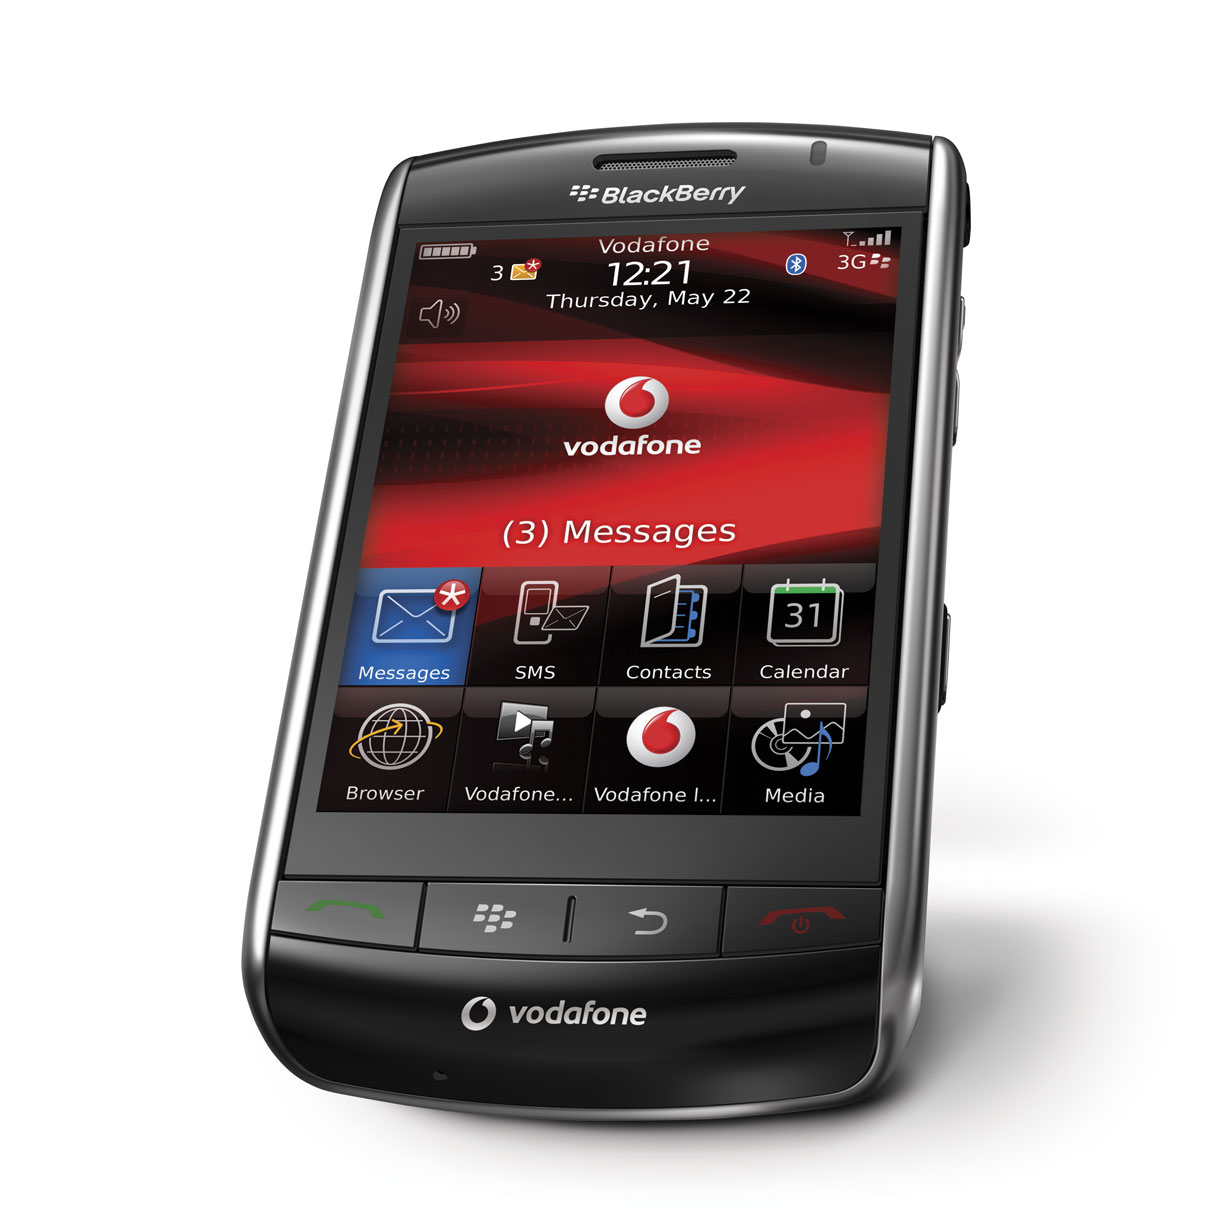 telecharger application blackberry 9500 storm